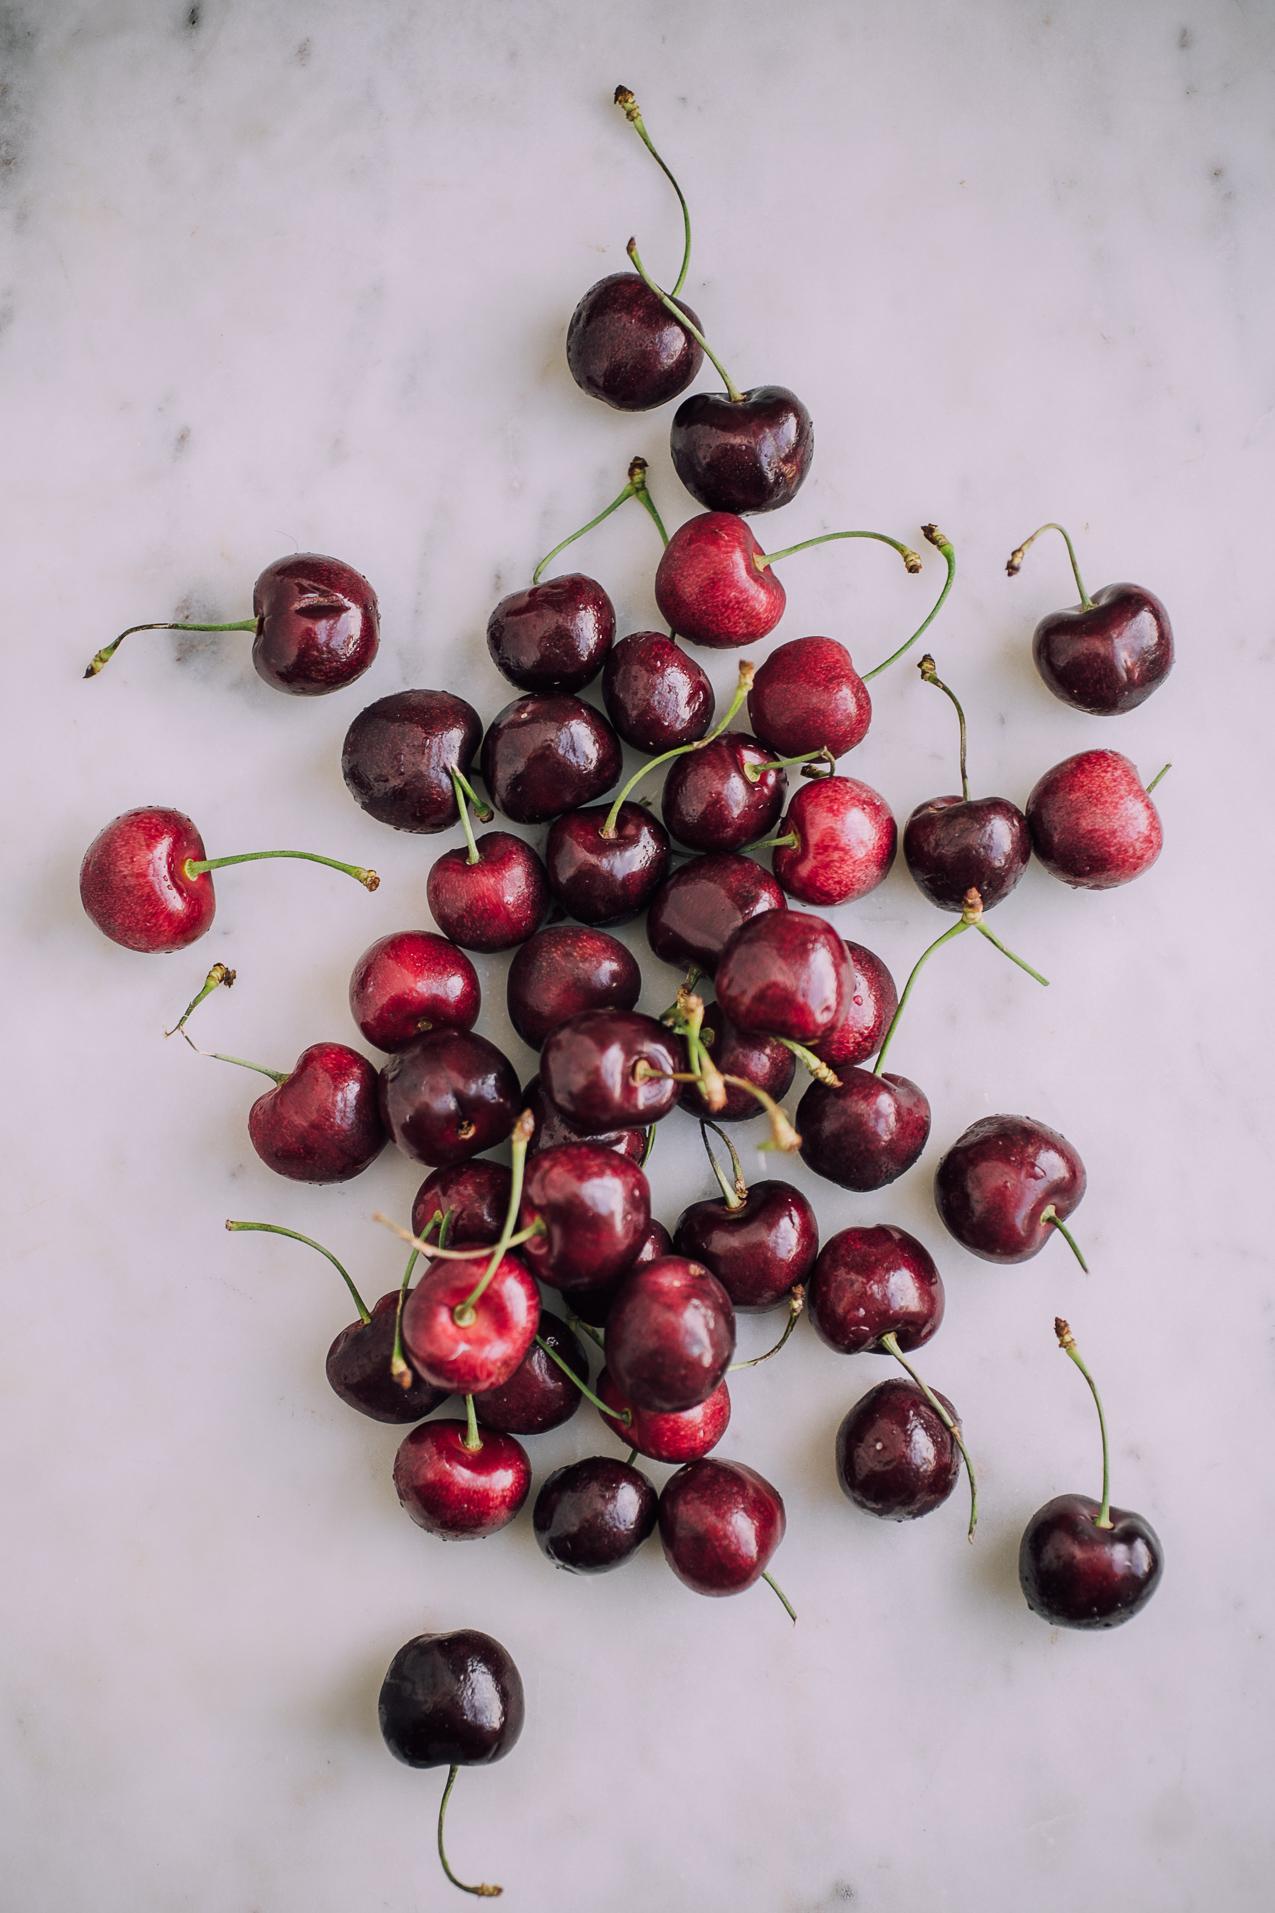 vegan-cherry-almond-popsicles-9051.jpg